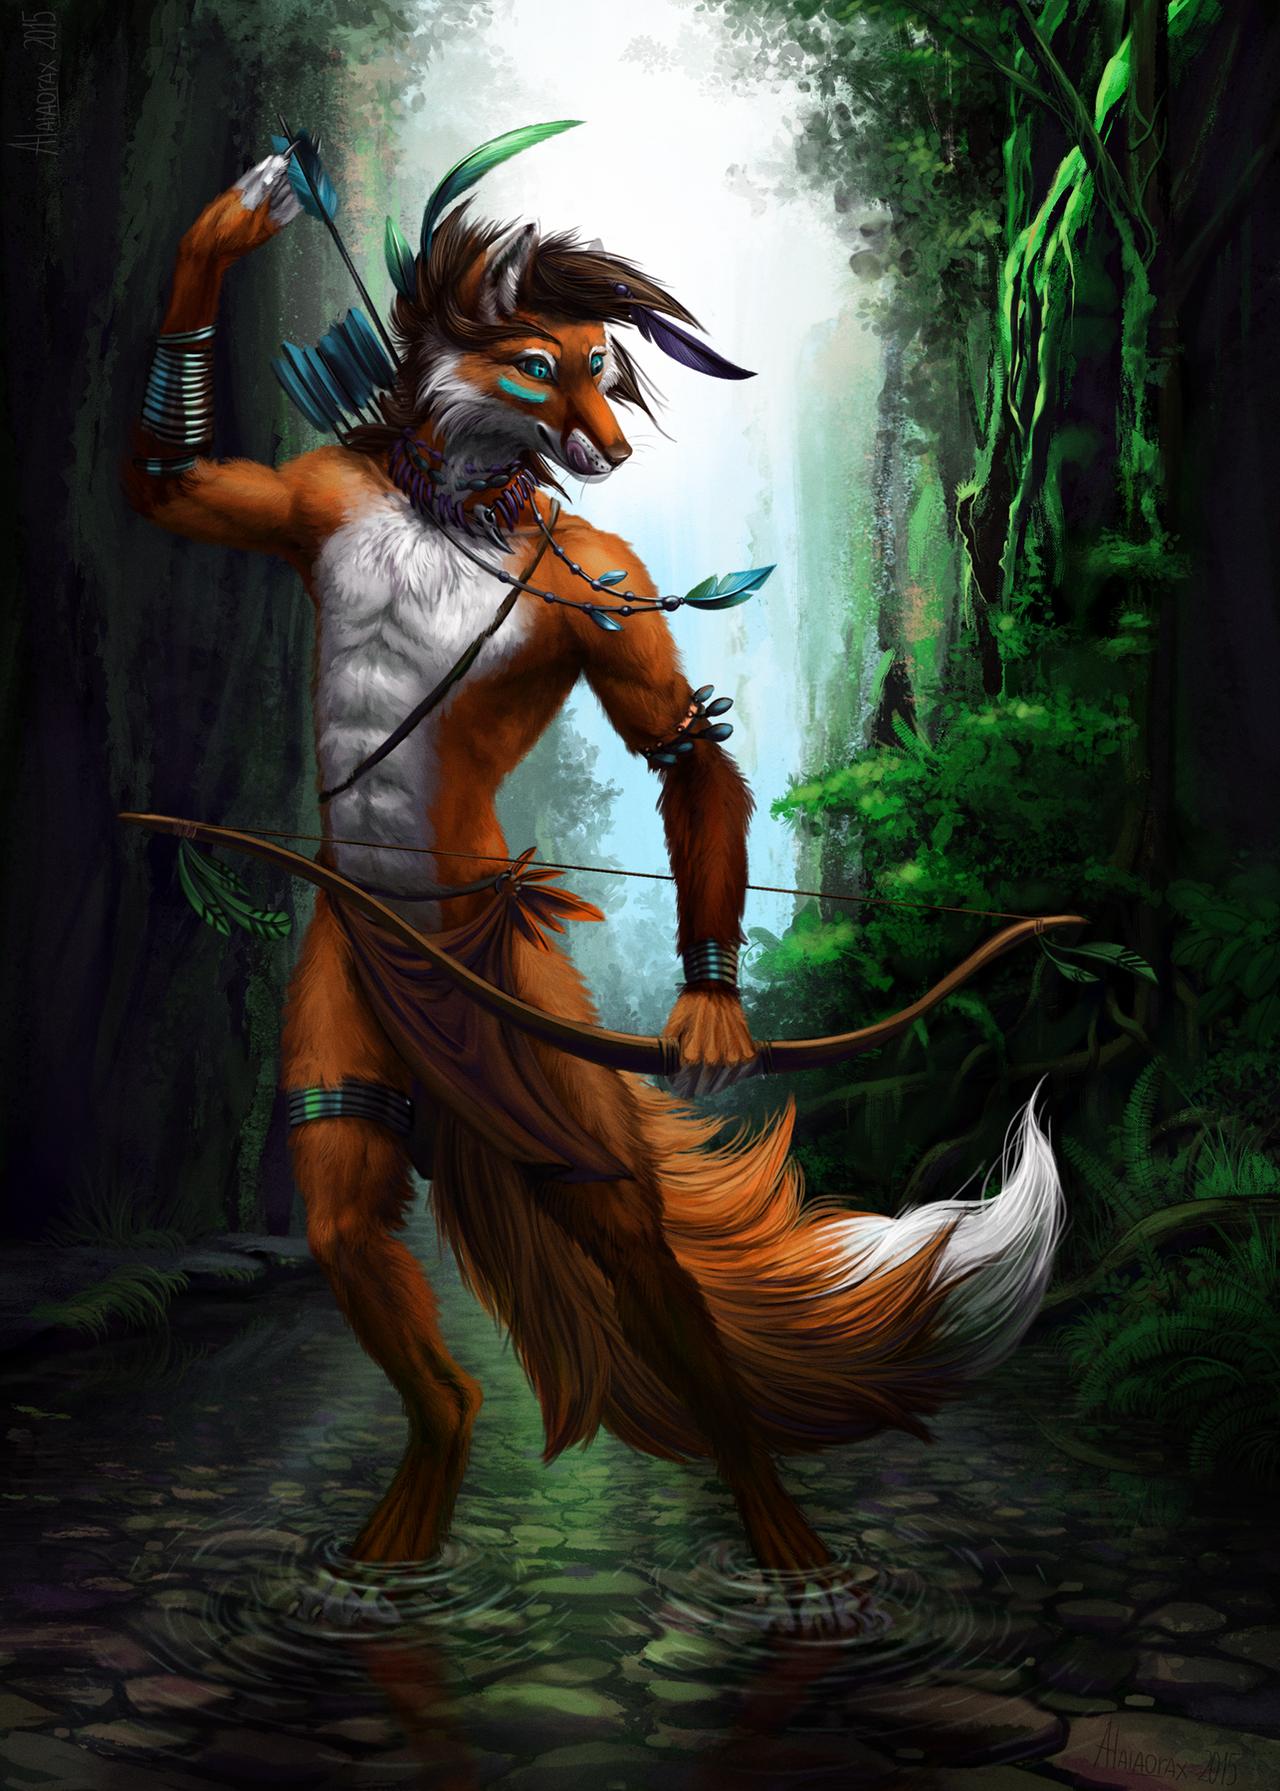 Wild hunter by Alaiaorax